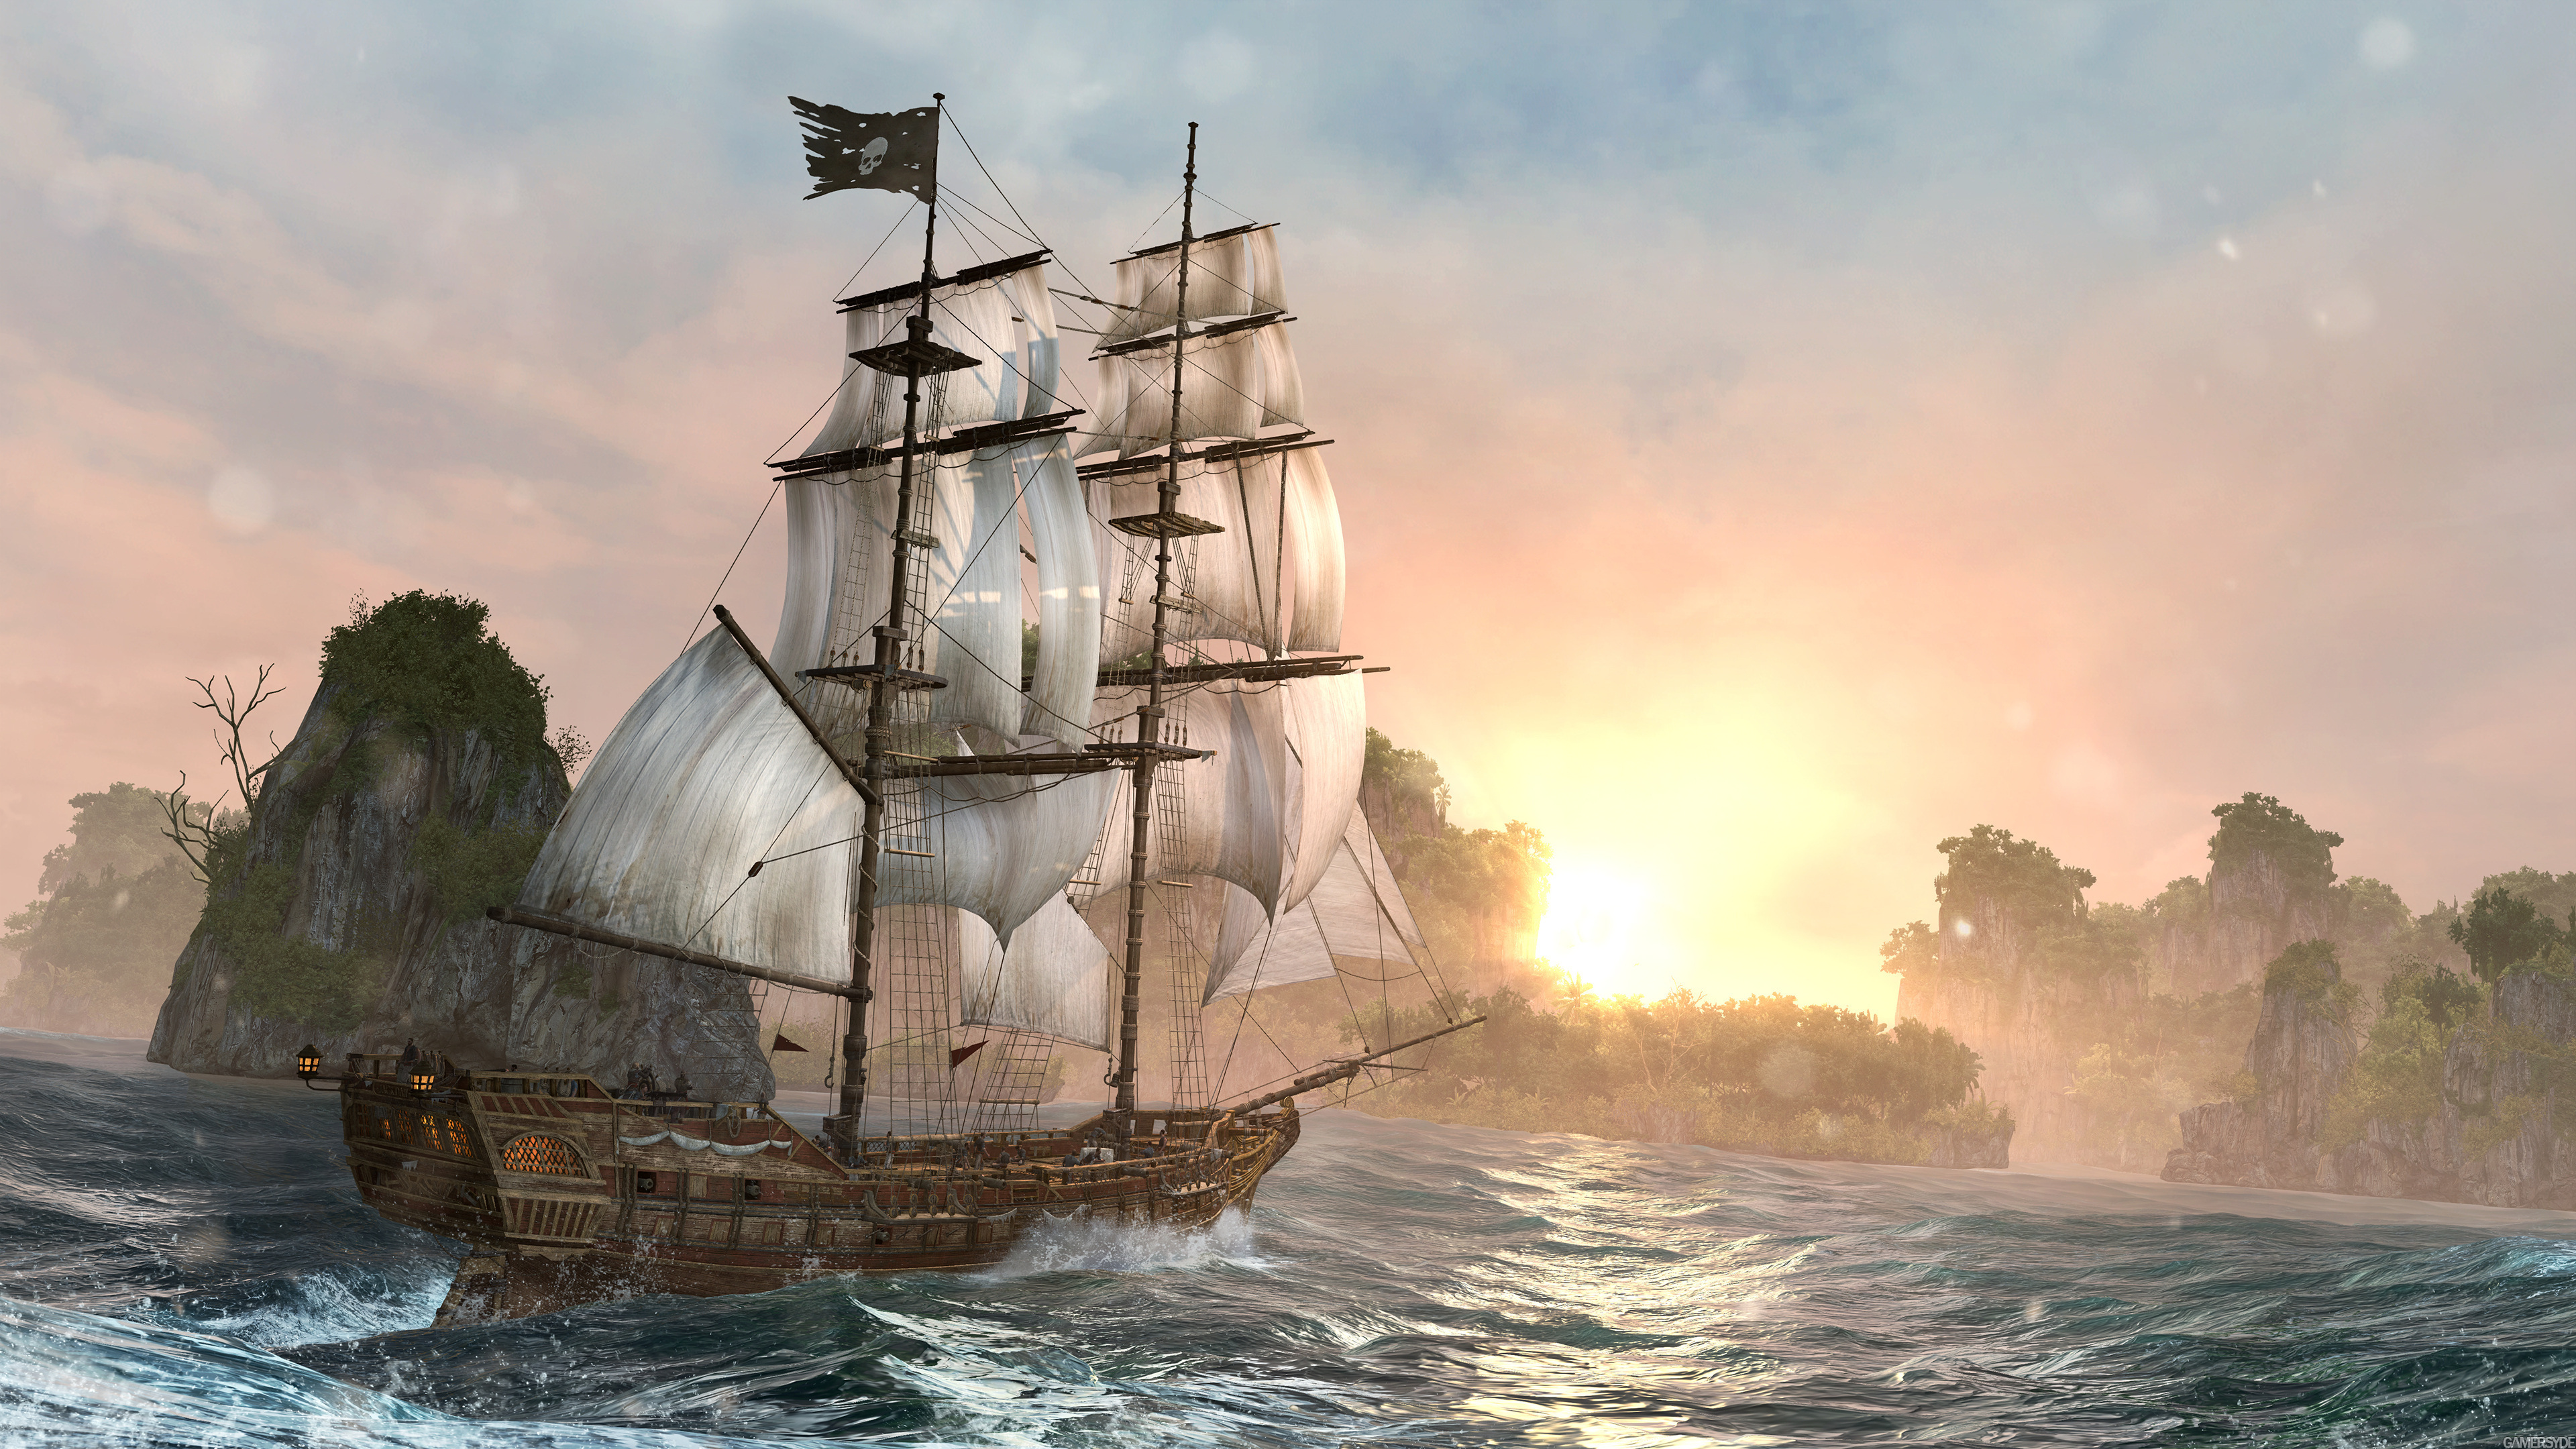 Assigncard_IV_video_game_ship_river_hd_sunrise_ultrahd_4k_wallpaper_3840x2160